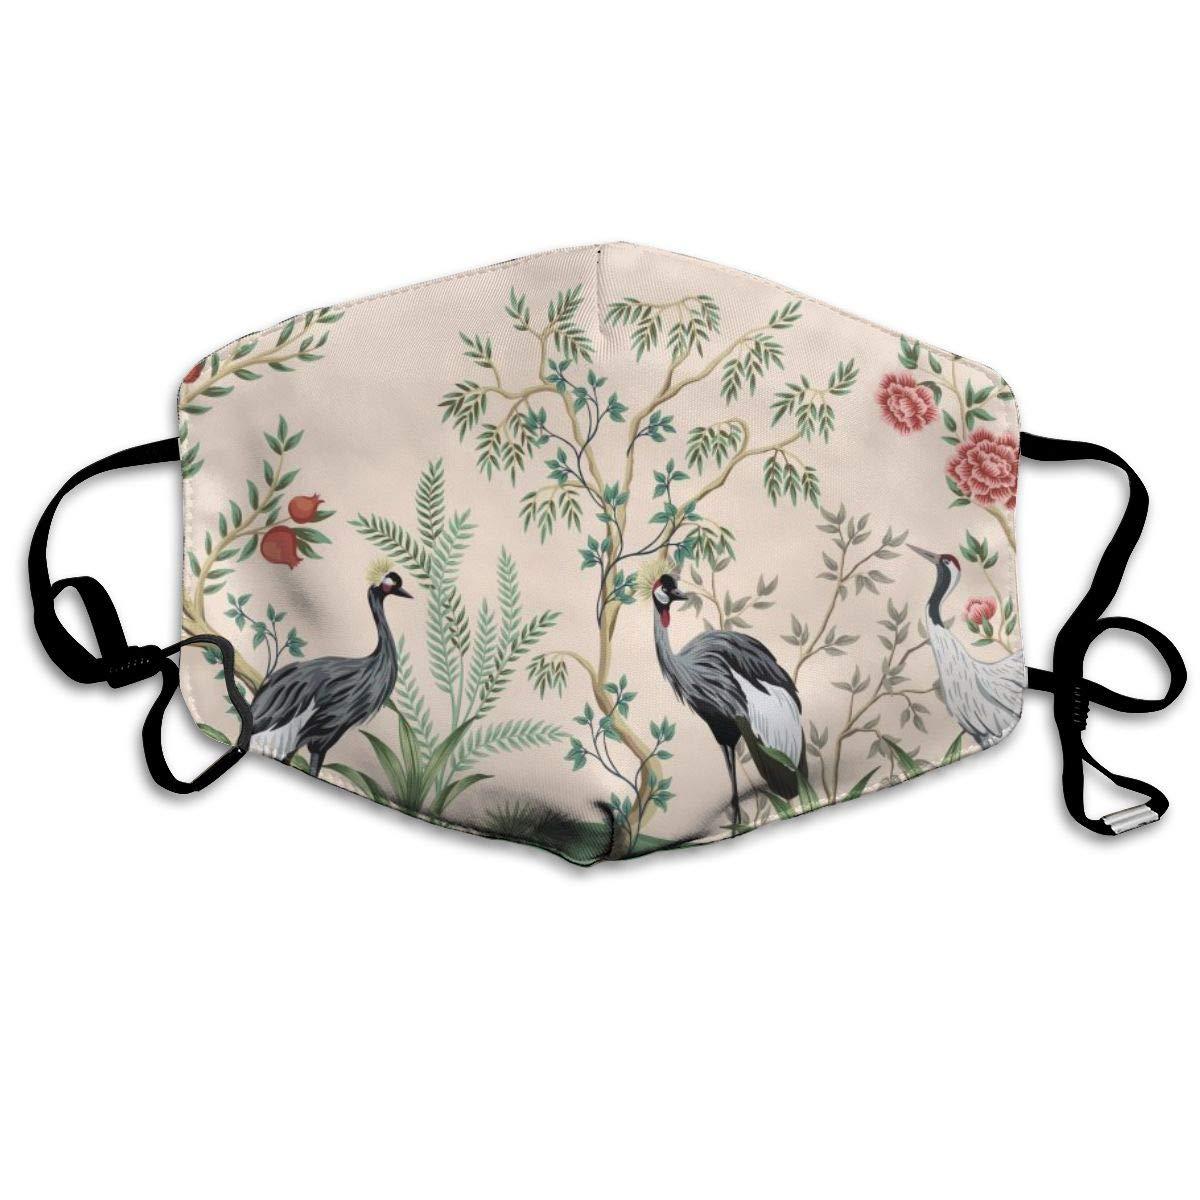 Mouth Mask Vintage Crane Bird Floral Tree Fashion Earloop Face Mask For Kids Teens Men Women Winter Summer